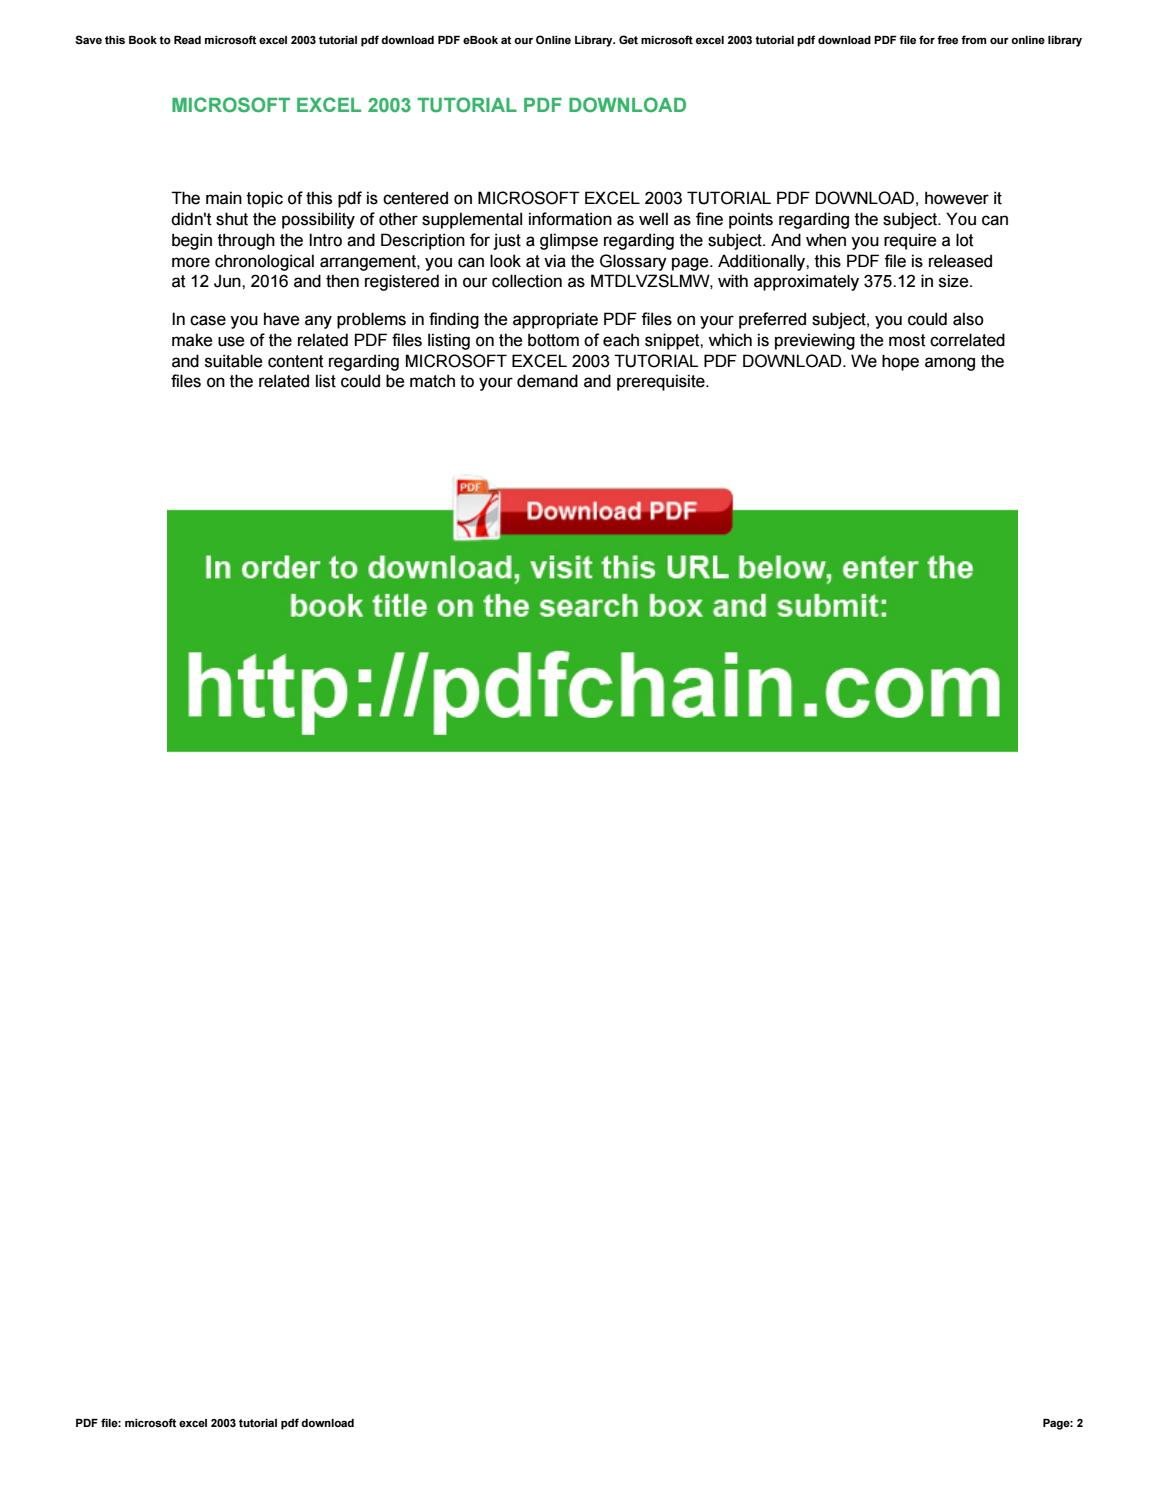 Excel 2003 Download